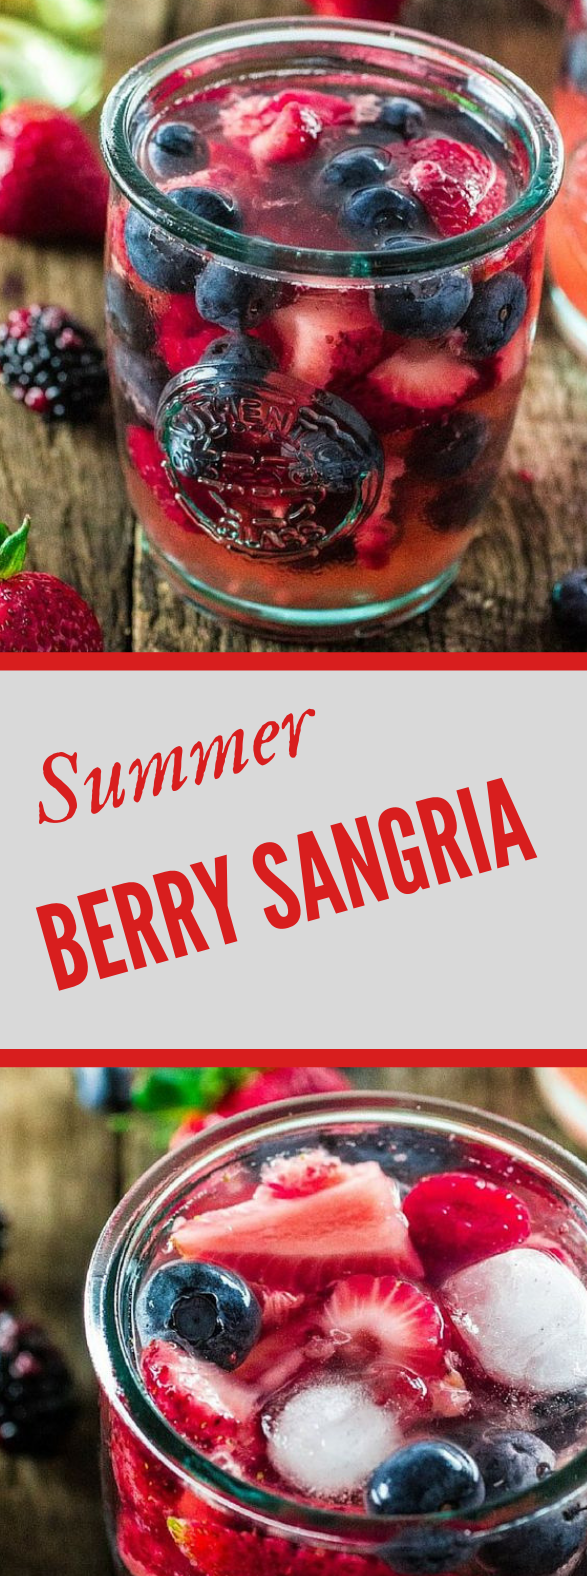 SUMMER BERRY SANGRIA #drink #healthydrink